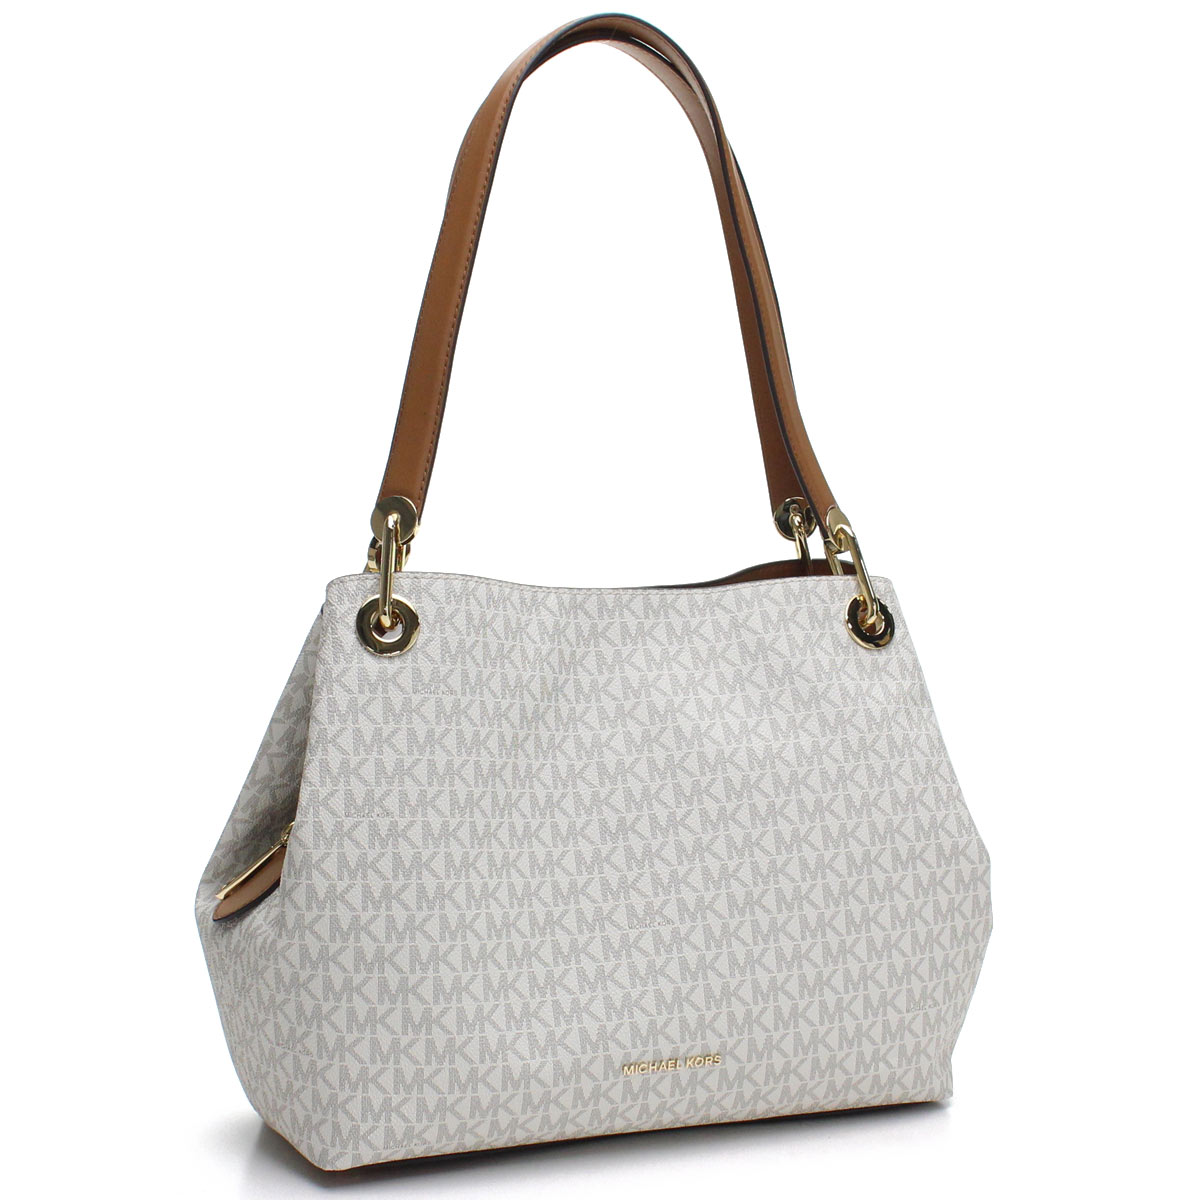 65aff70ce4d0 Bighit The total brand wholesale  Michael Kors MICHAEL KORS RAVEN tote bag  30H6GRXE3V PVC 150 VANILLA white system